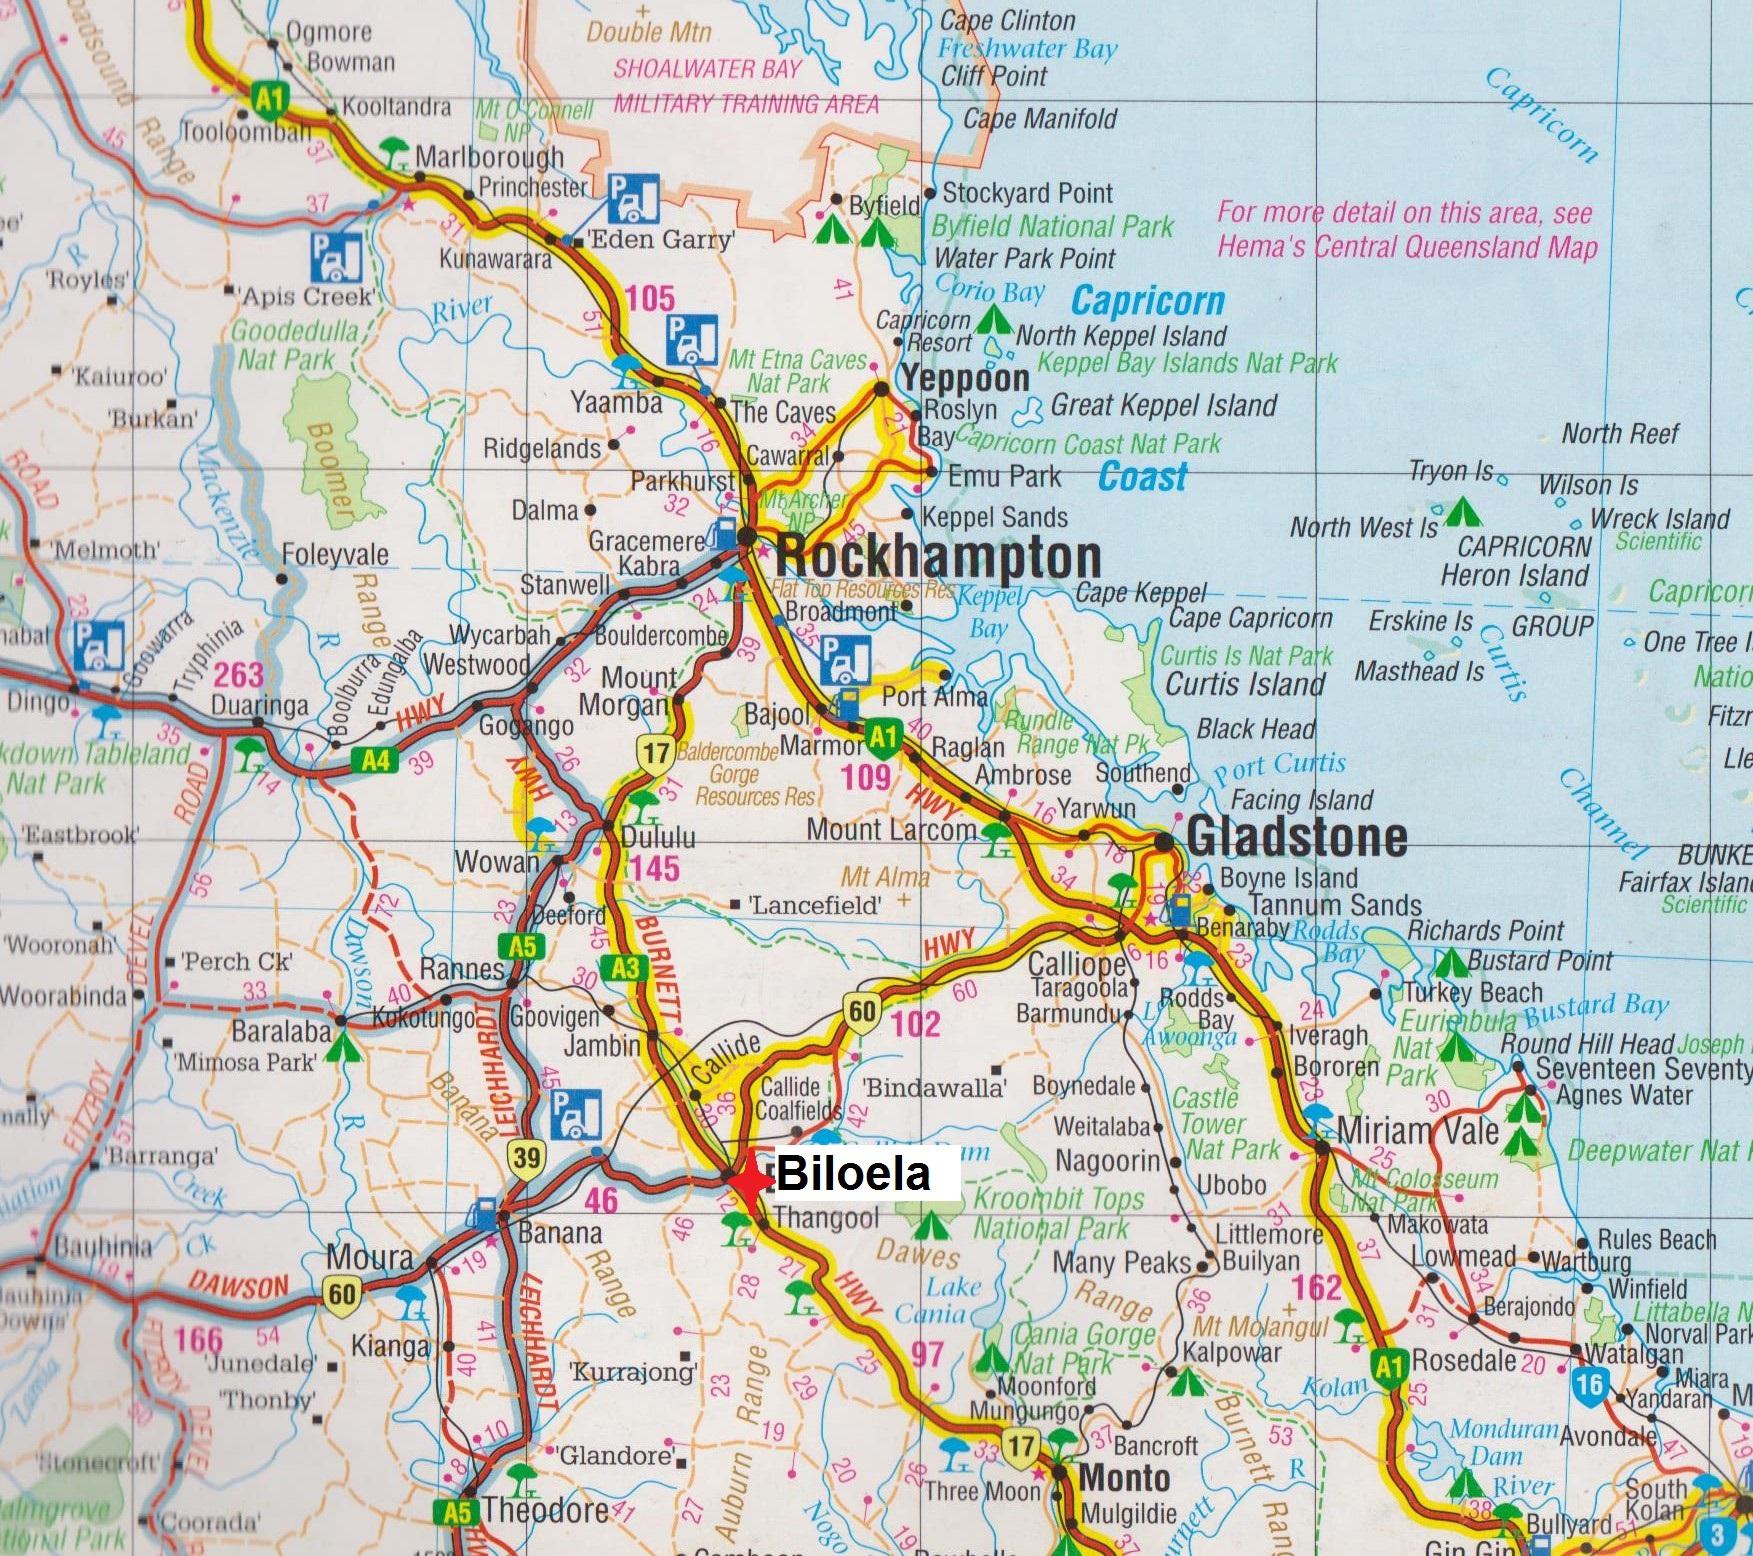 Queensland Australian Abattoirs Page 4 Avondale Caravan Wiring Diagram Map Biloela